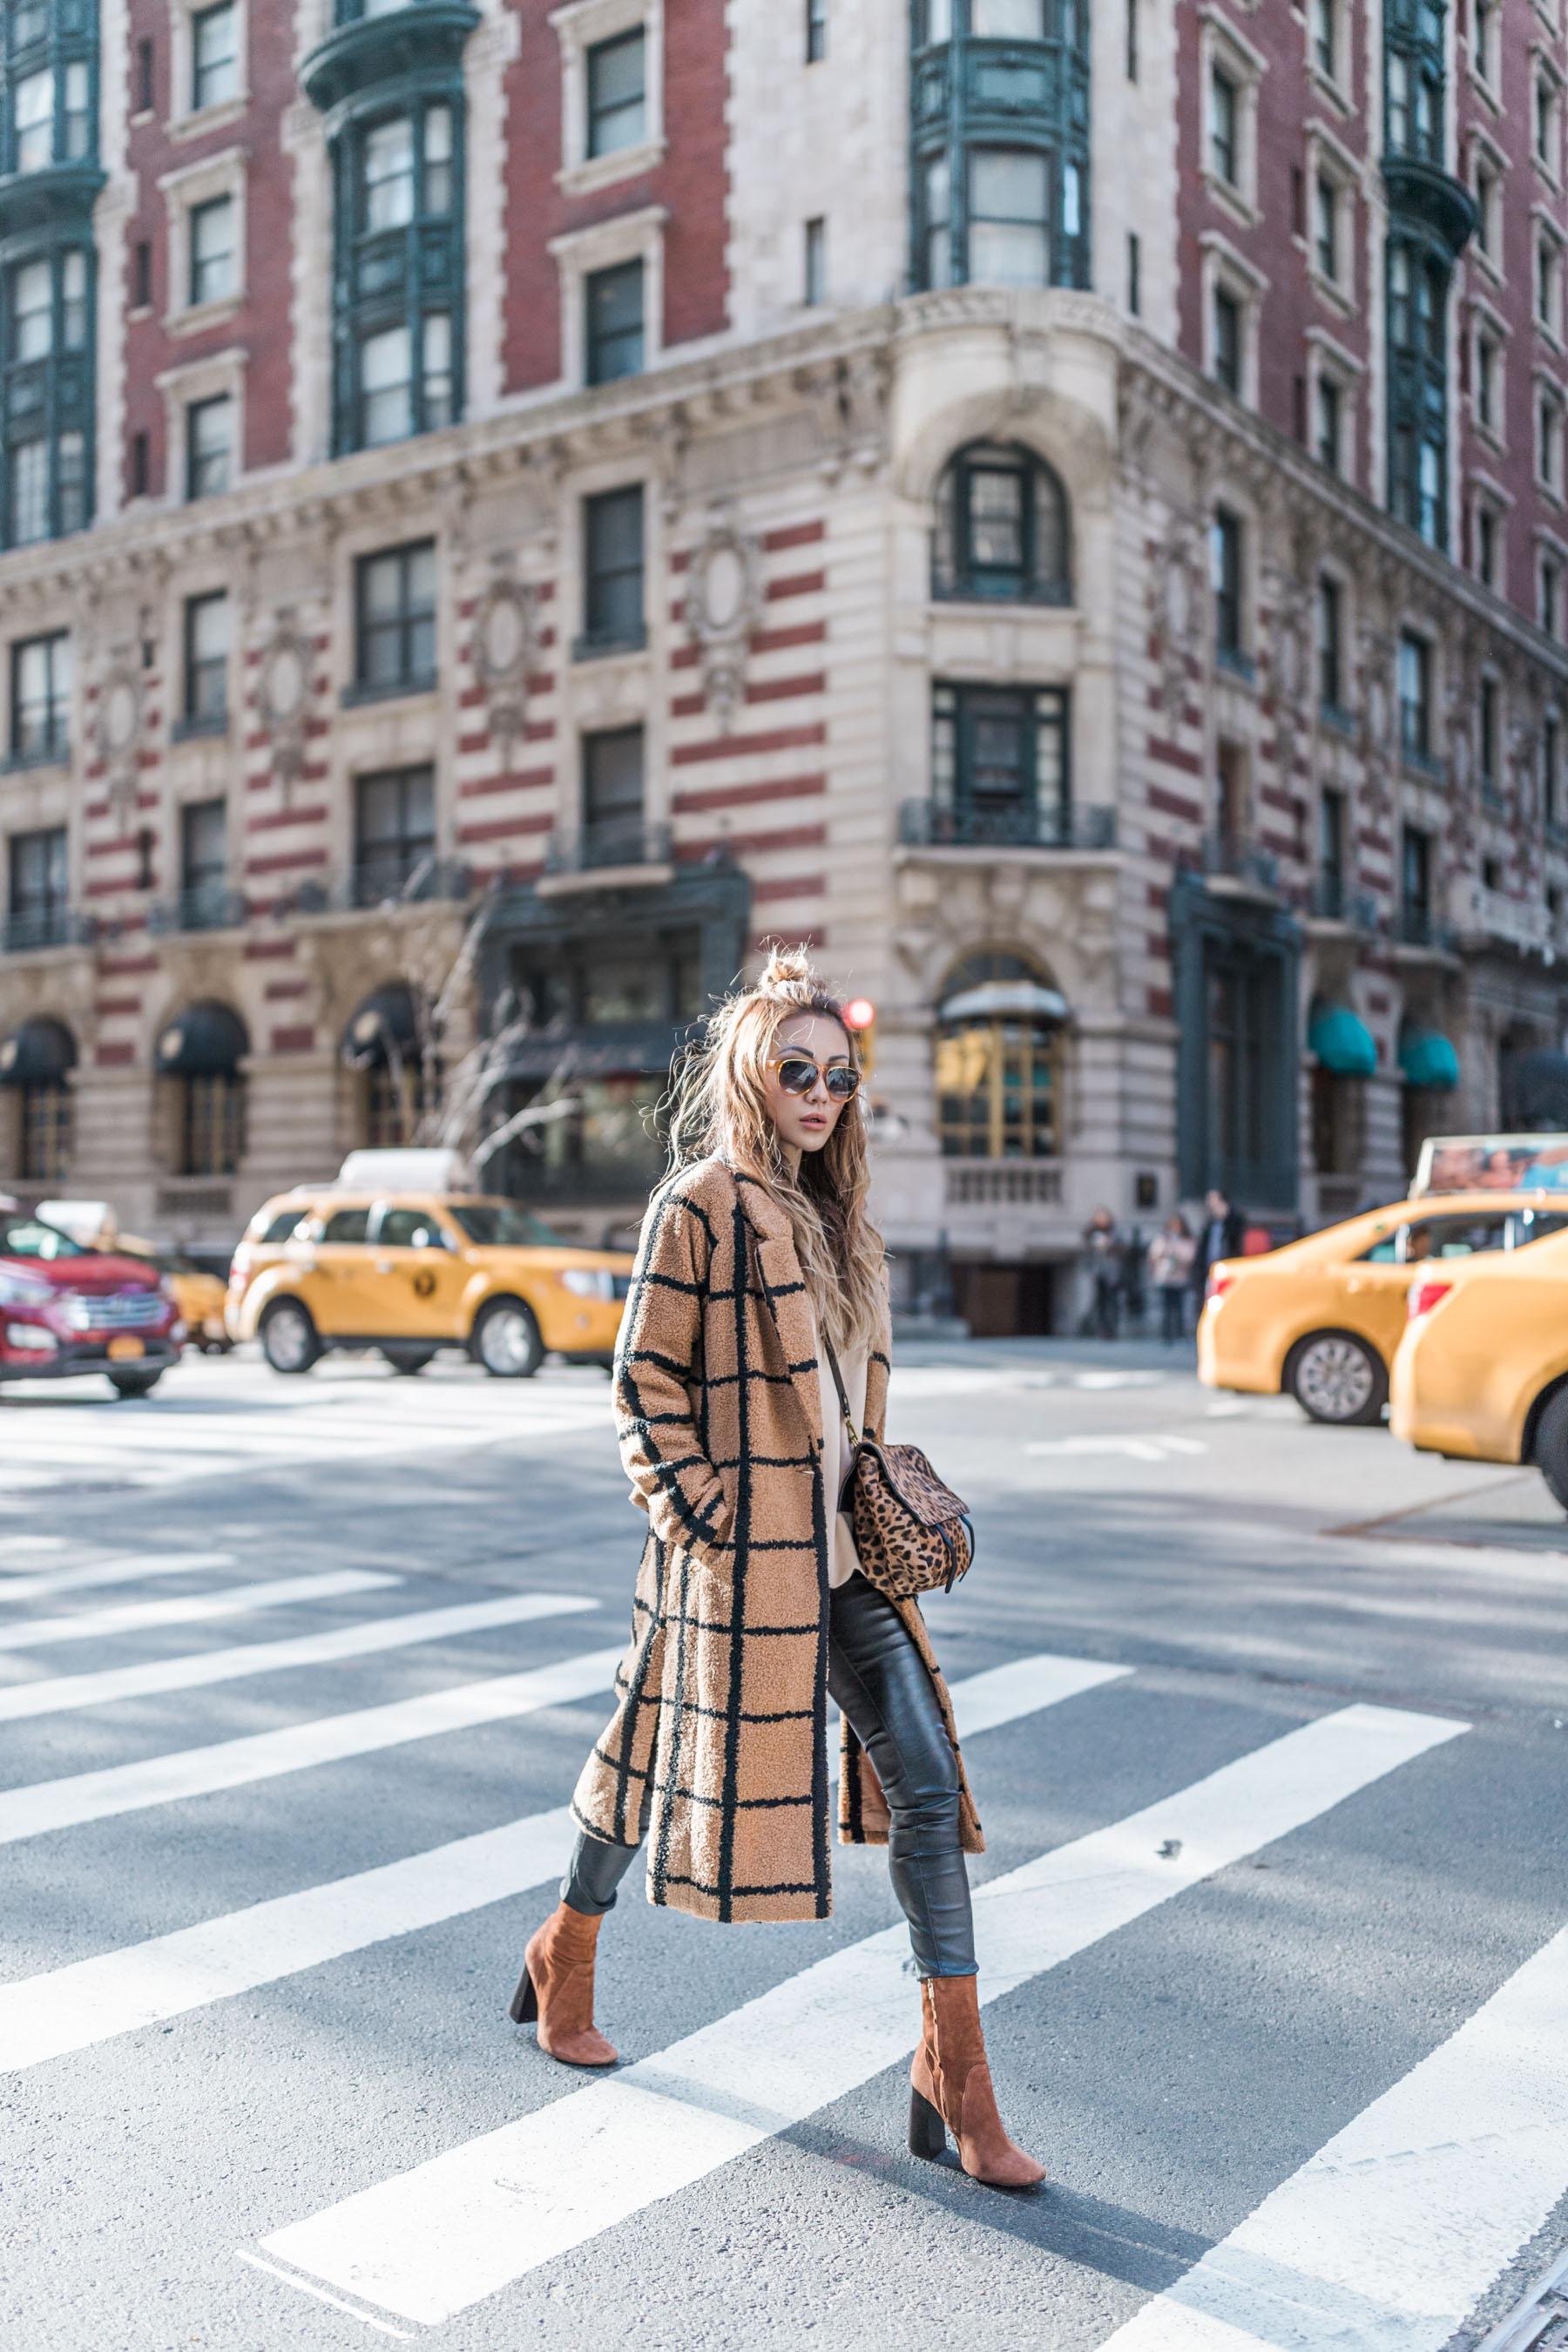 plaid-teddy-coat-leopard-bag-leather-pants-brown-ankle-boots-notjessfashion-900x1350@2x